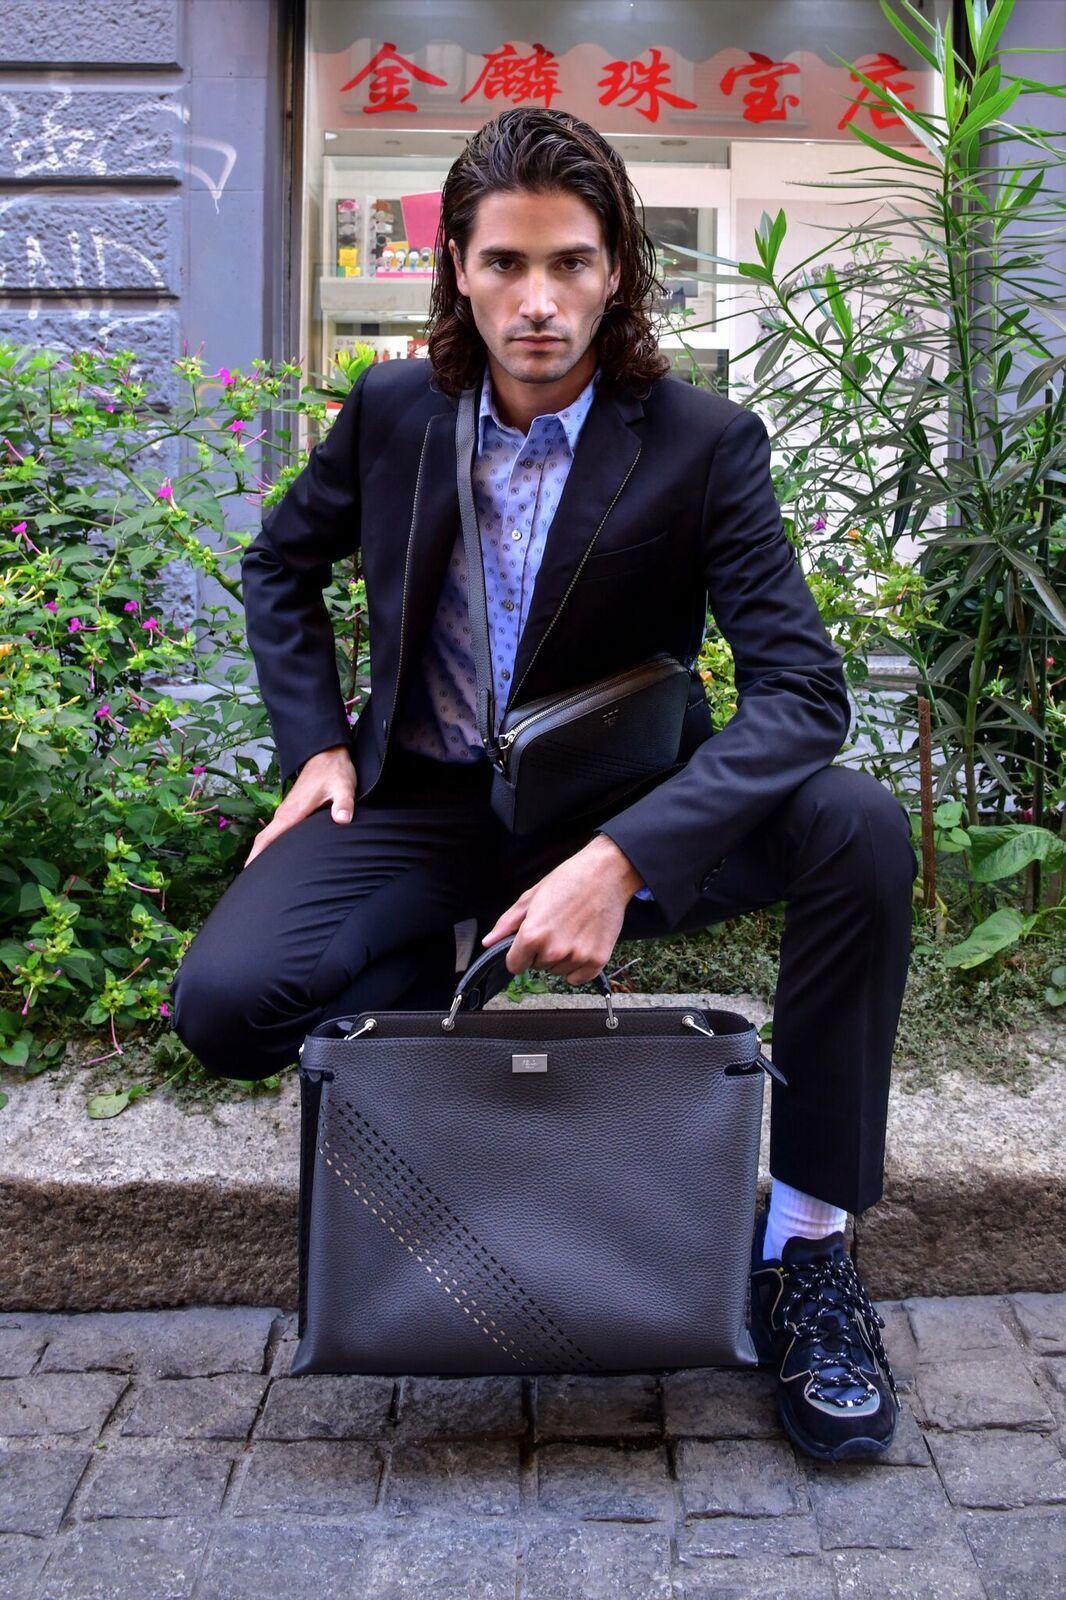 FENDI推出「Selleria Degradé Stitching」系列包款